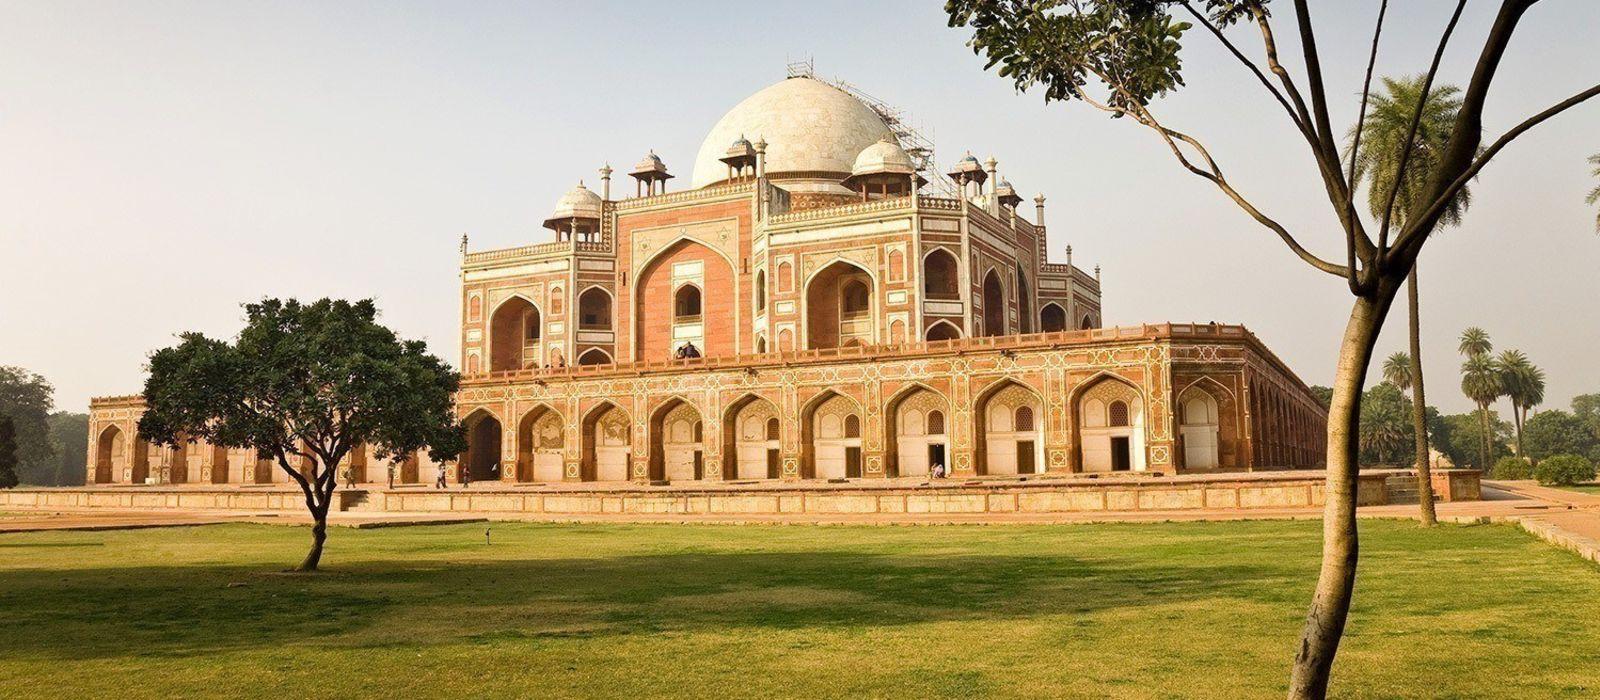 Golden Triangle of India Tour Trip 4